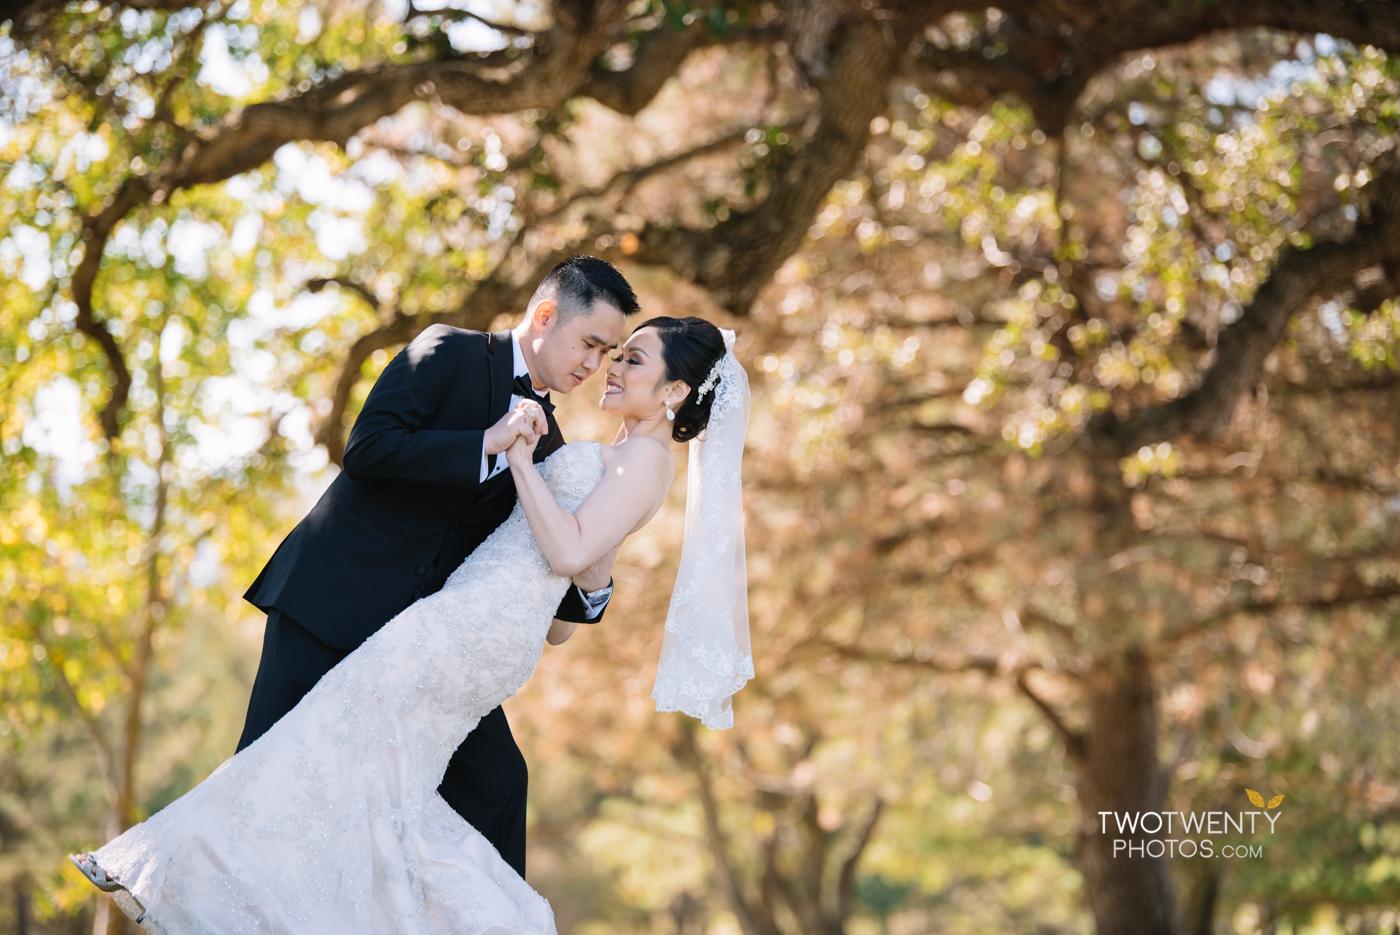 boundary-oaks-golf-course-wedding-walnut-grove-8